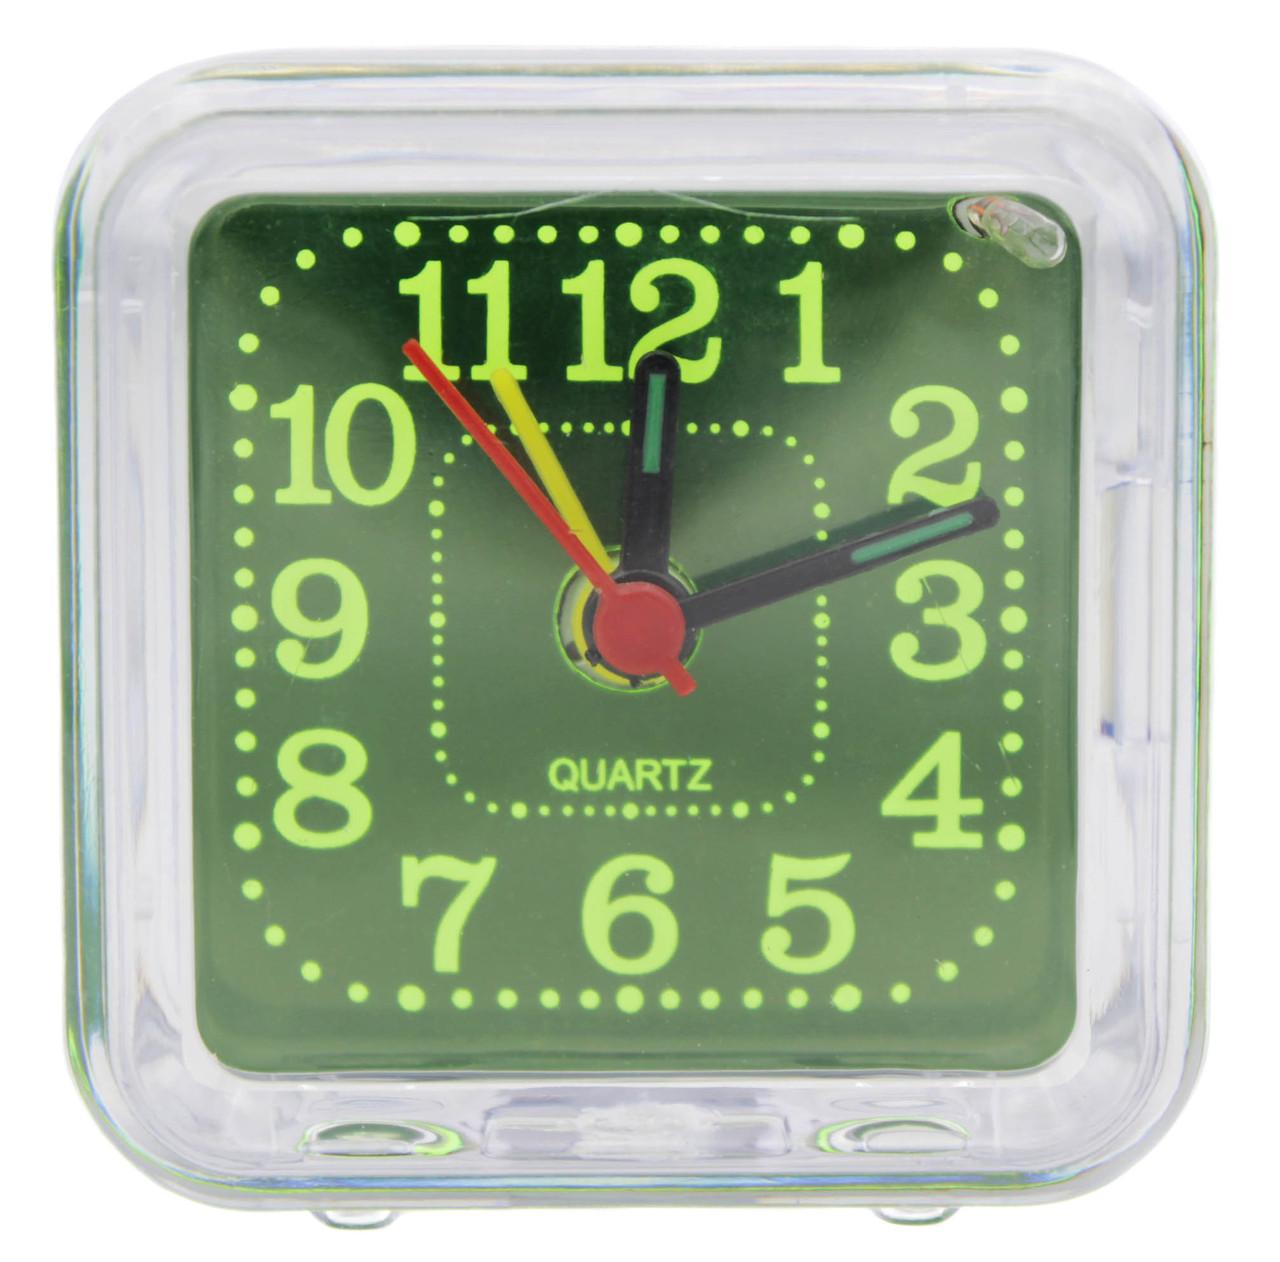 Часы будильник XHY-927 6*6.5*3